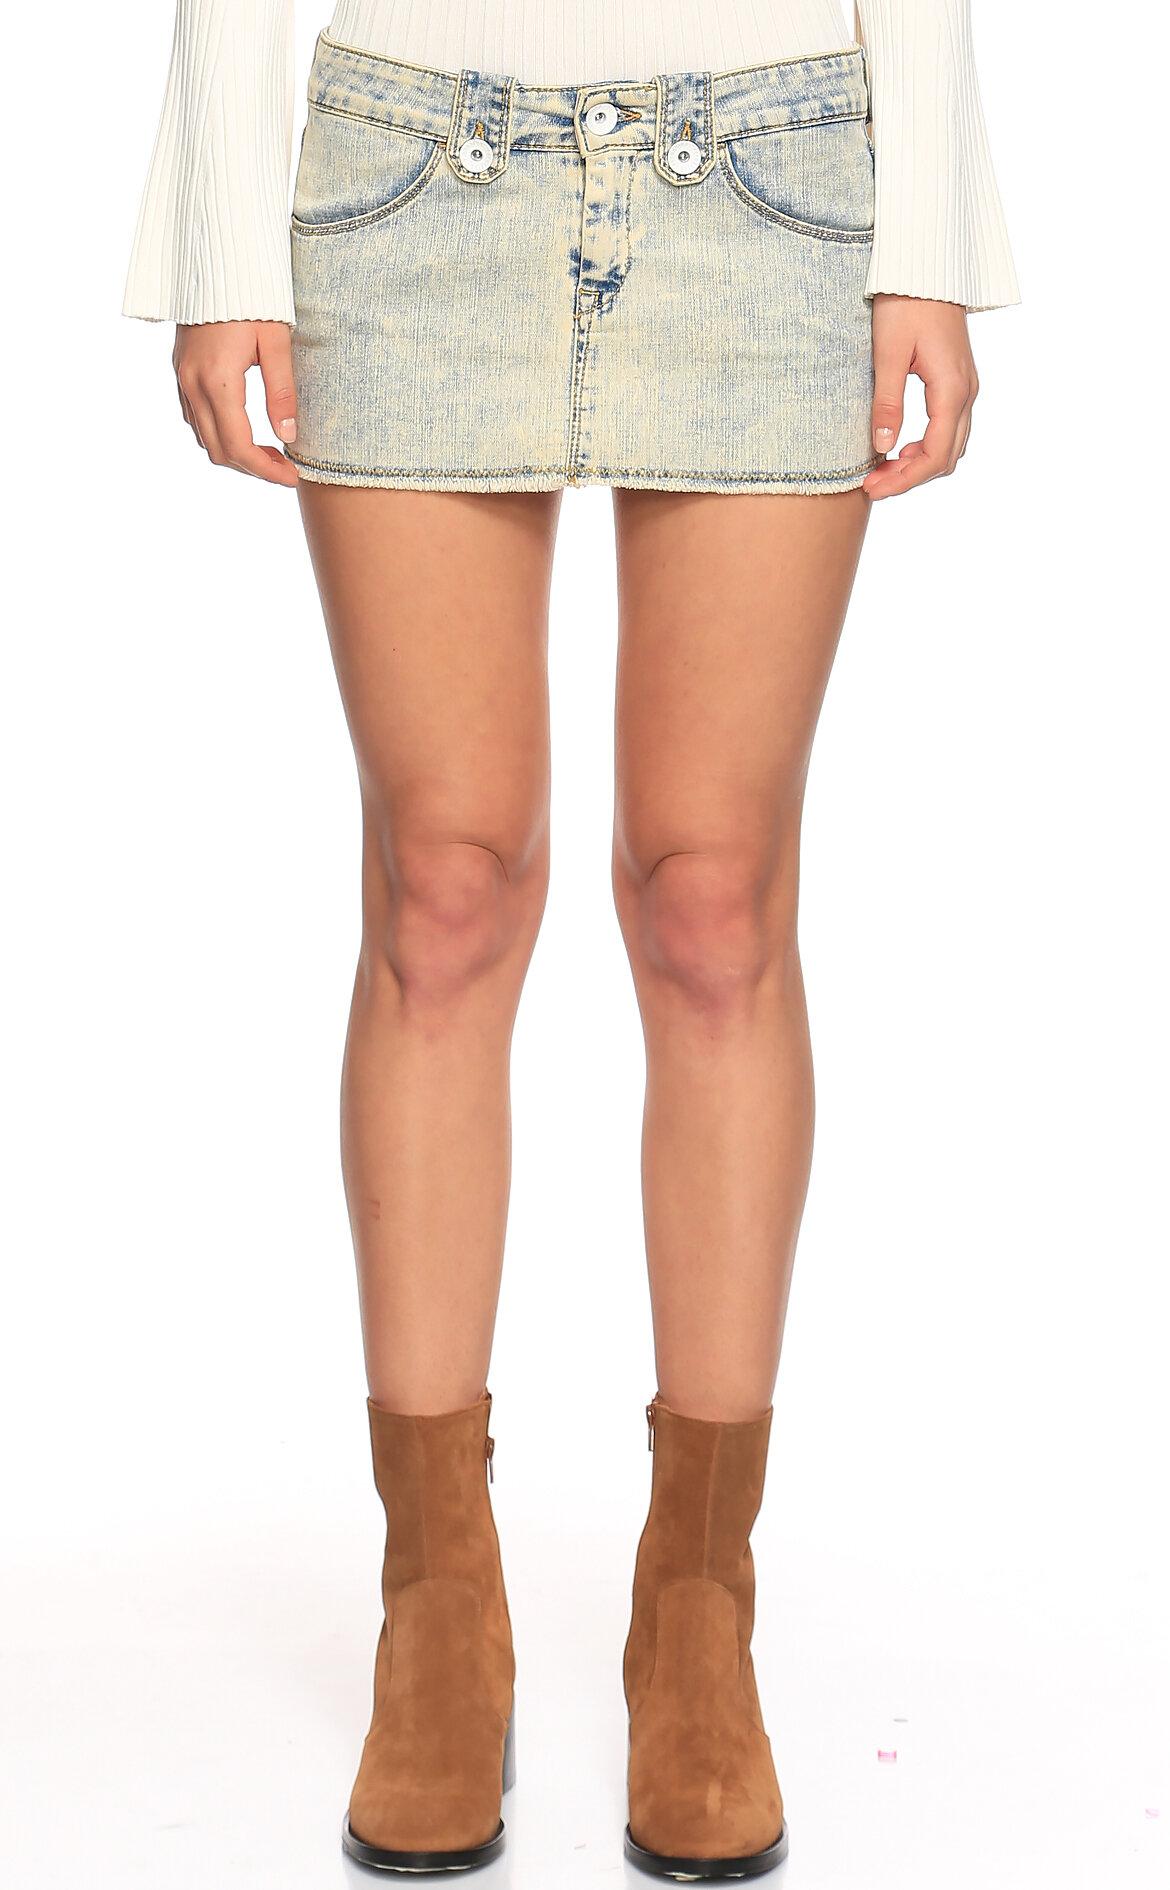 Fornarina Jeans-Fornarina Jeans Buz Mavisi Mini Jean Etek